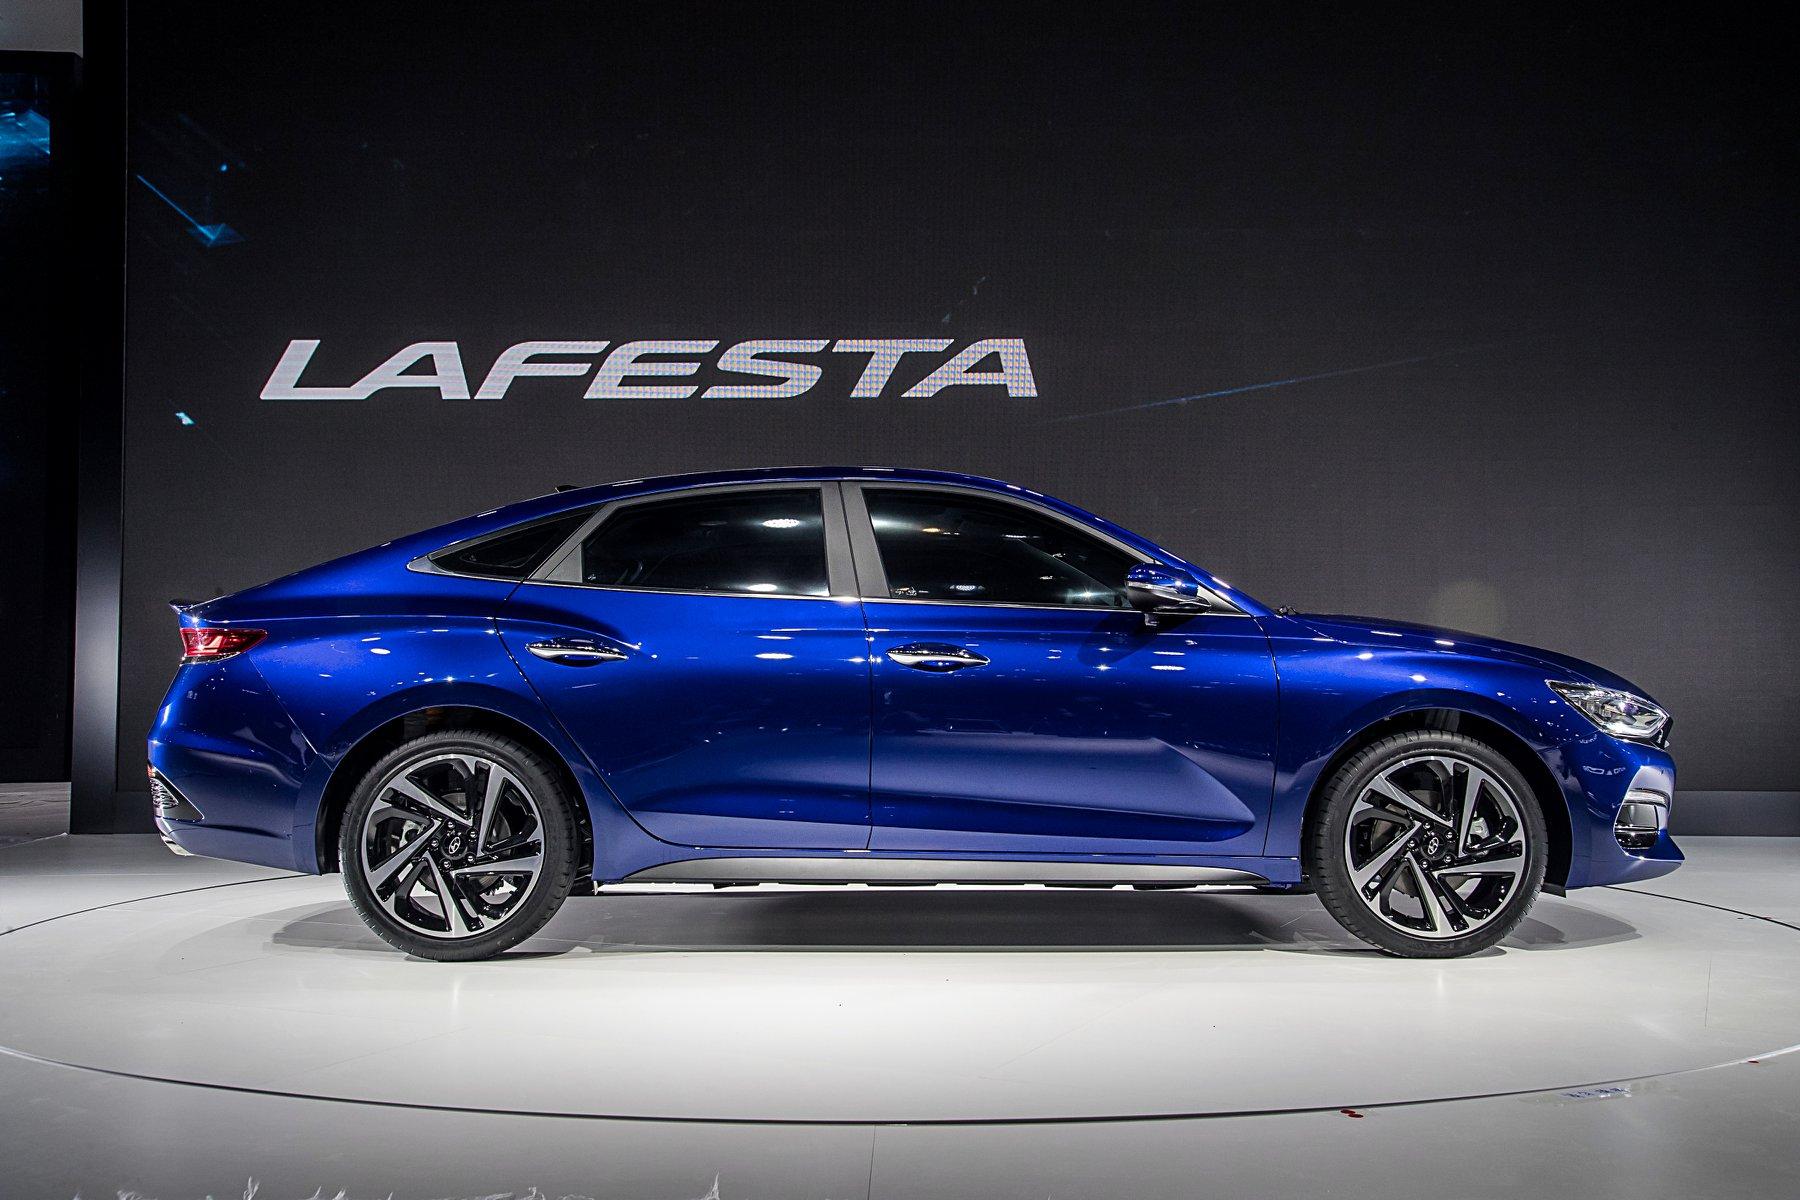 Hyundai Lafesta Debuts In China Audi A7 Meets The Mustang